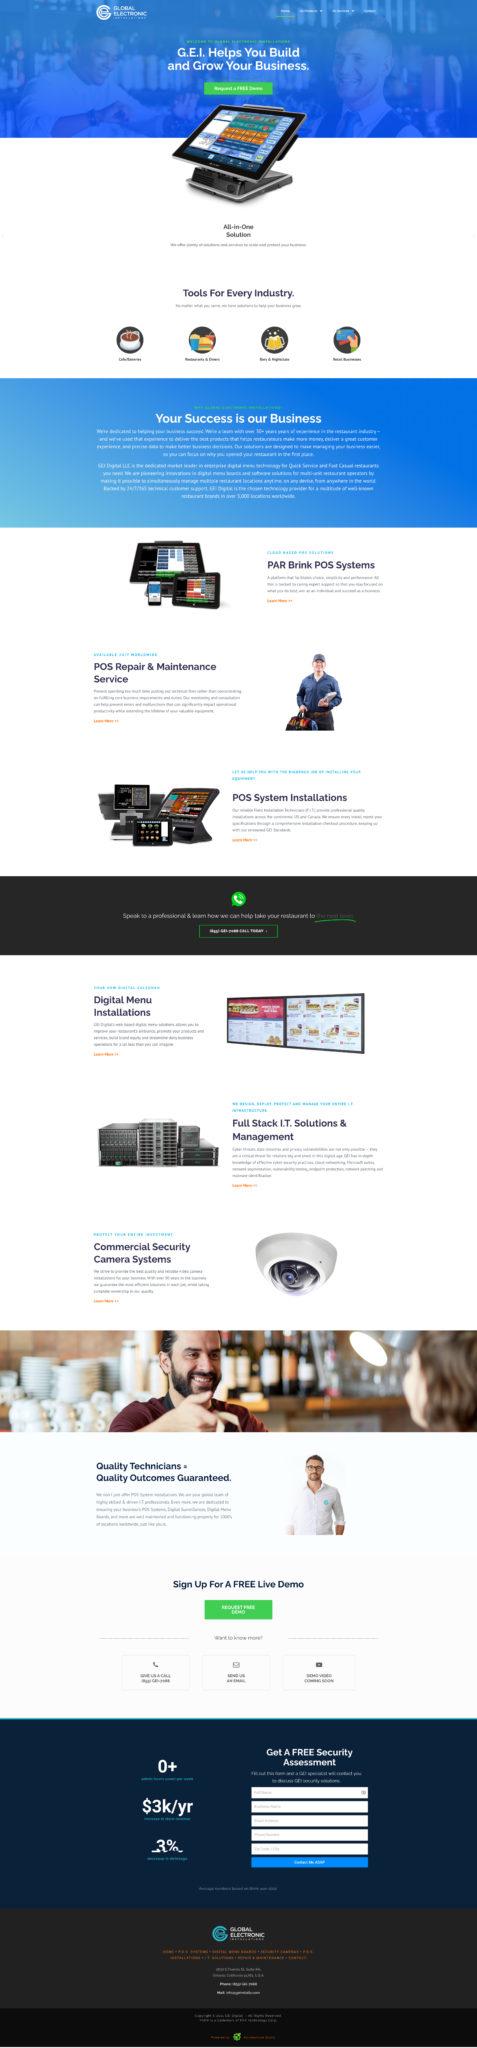 Home-GEI-Digital-Website-Design-by-Astronomical-Studio